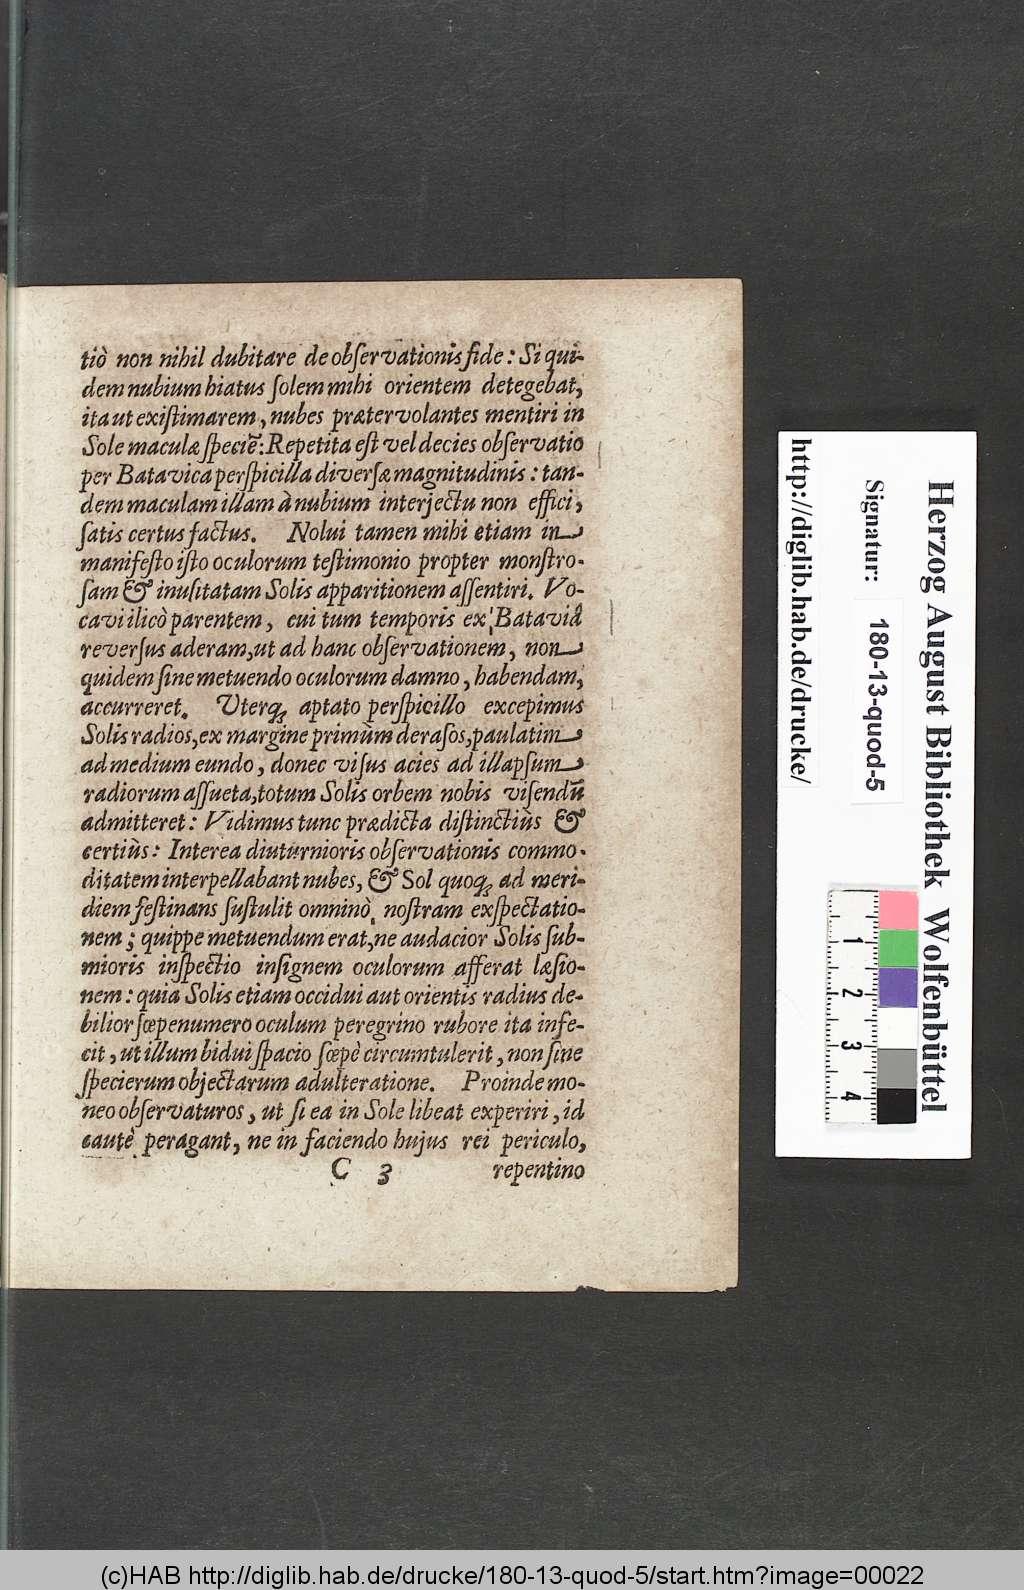 http://diglib.hab.de/drucke/180-13-quod-5/00022.jpg